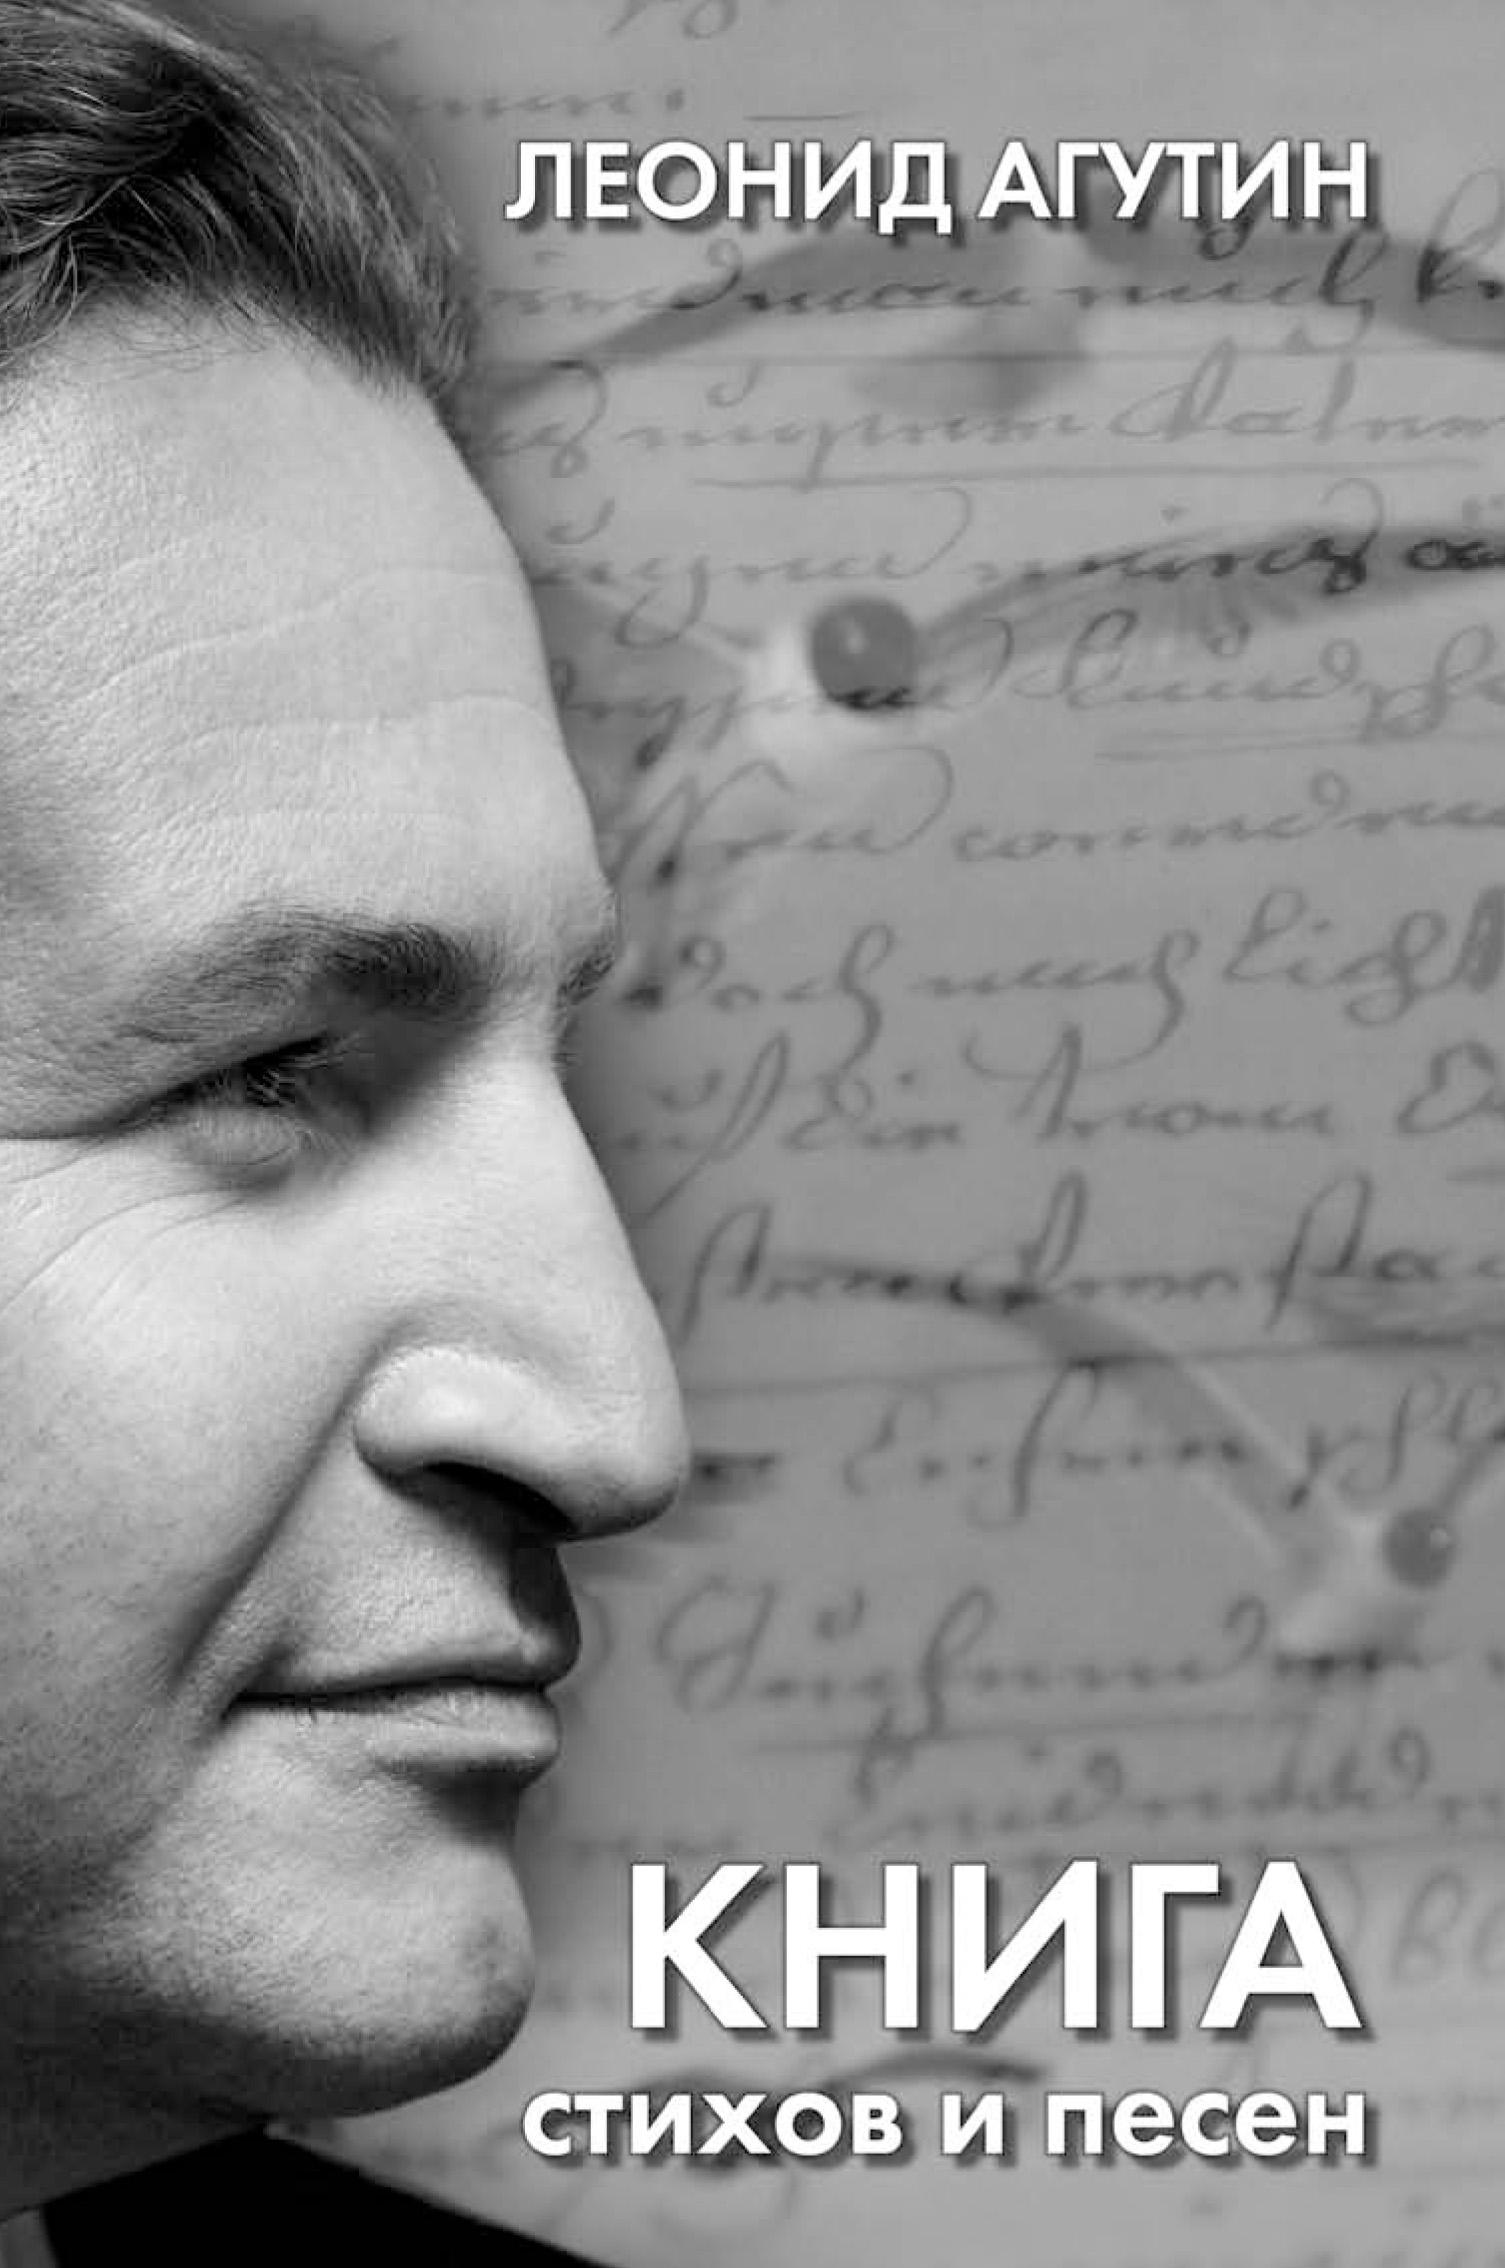 Леонид Агутин Книга стихов и песен леонид агутин леонид агутин история любви